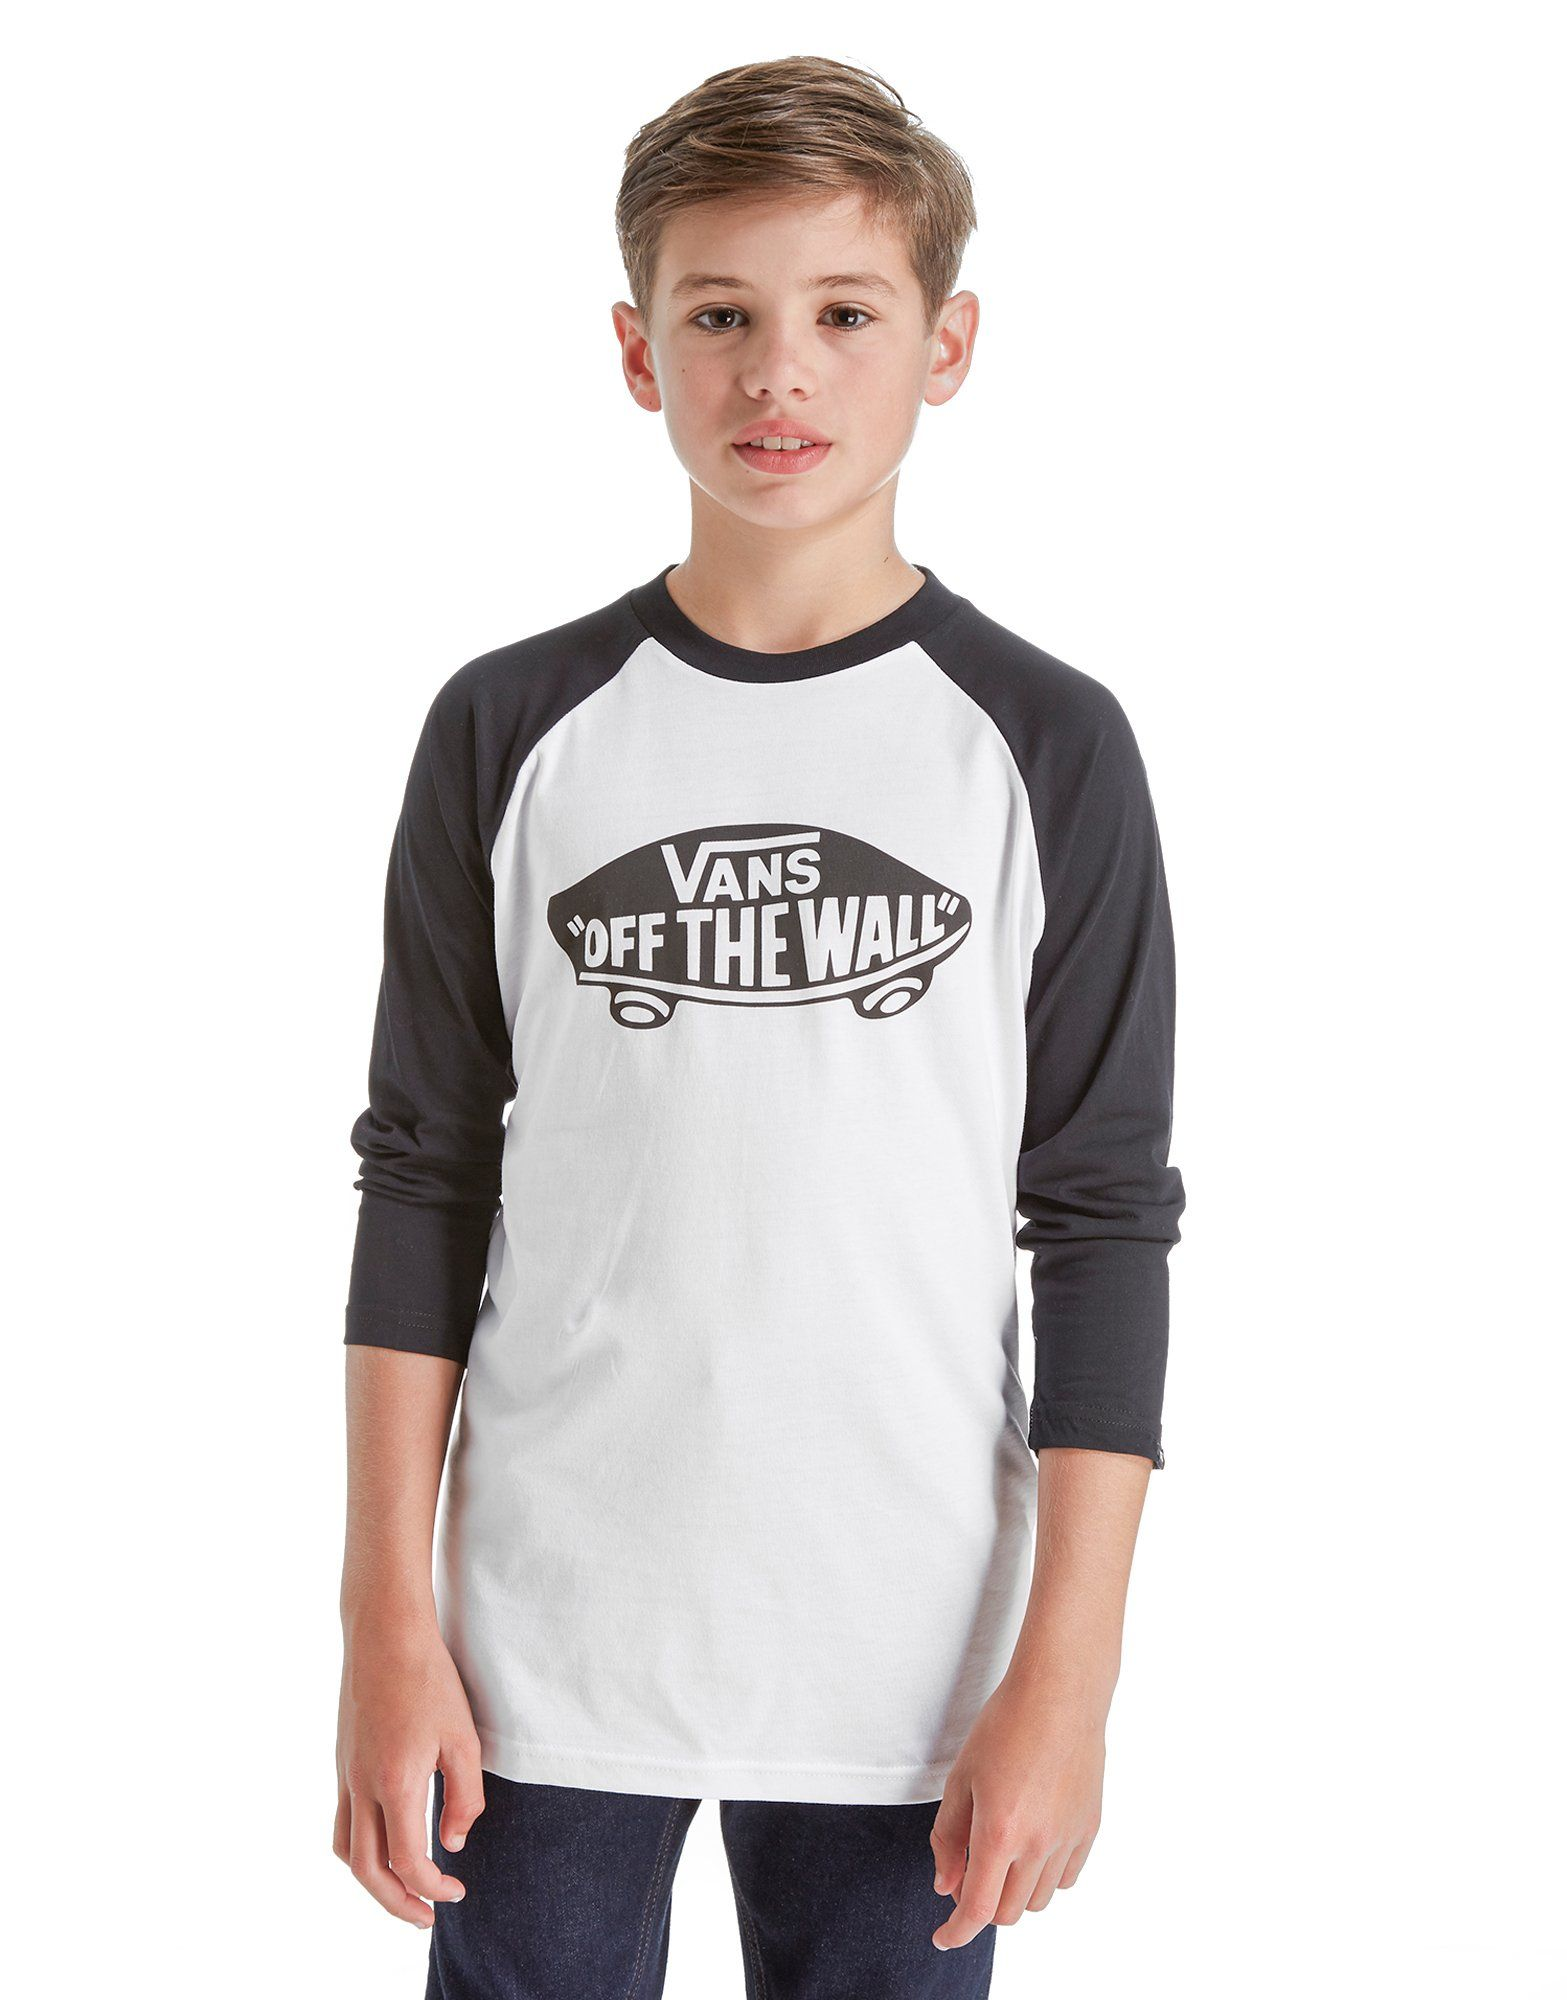 vans shirts kids